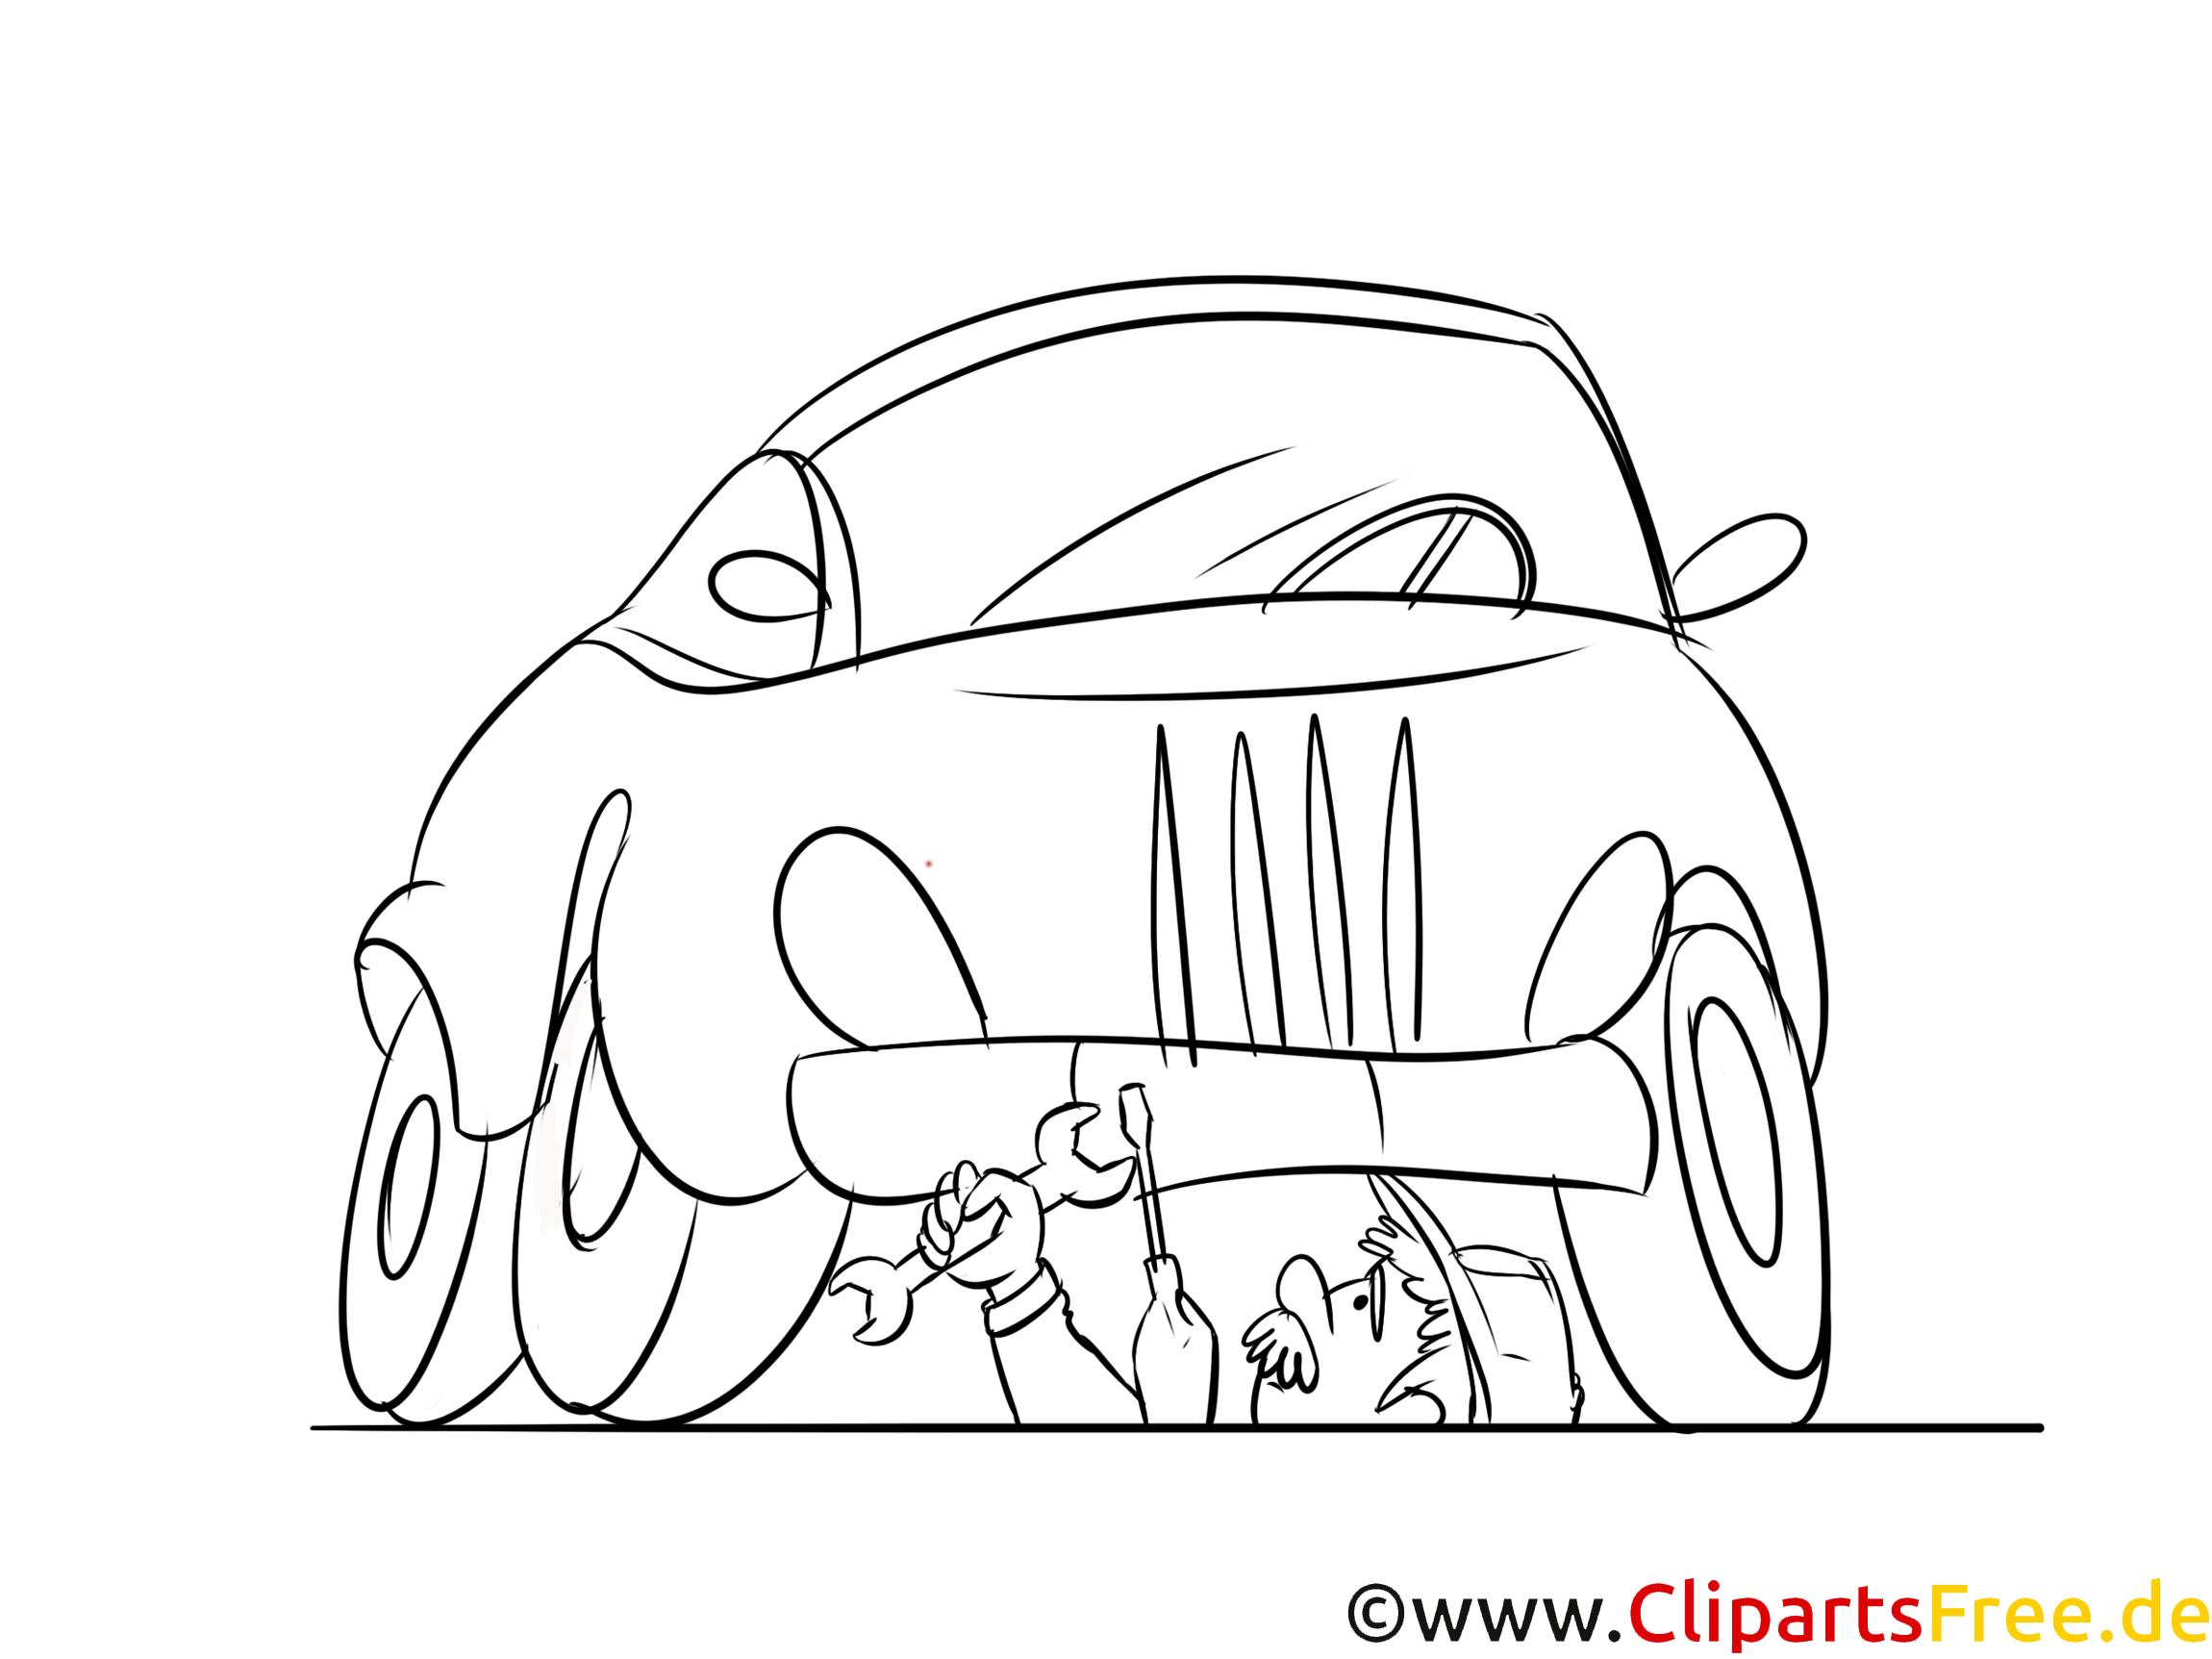 Autoreparatur Ausmalbild kostenlos